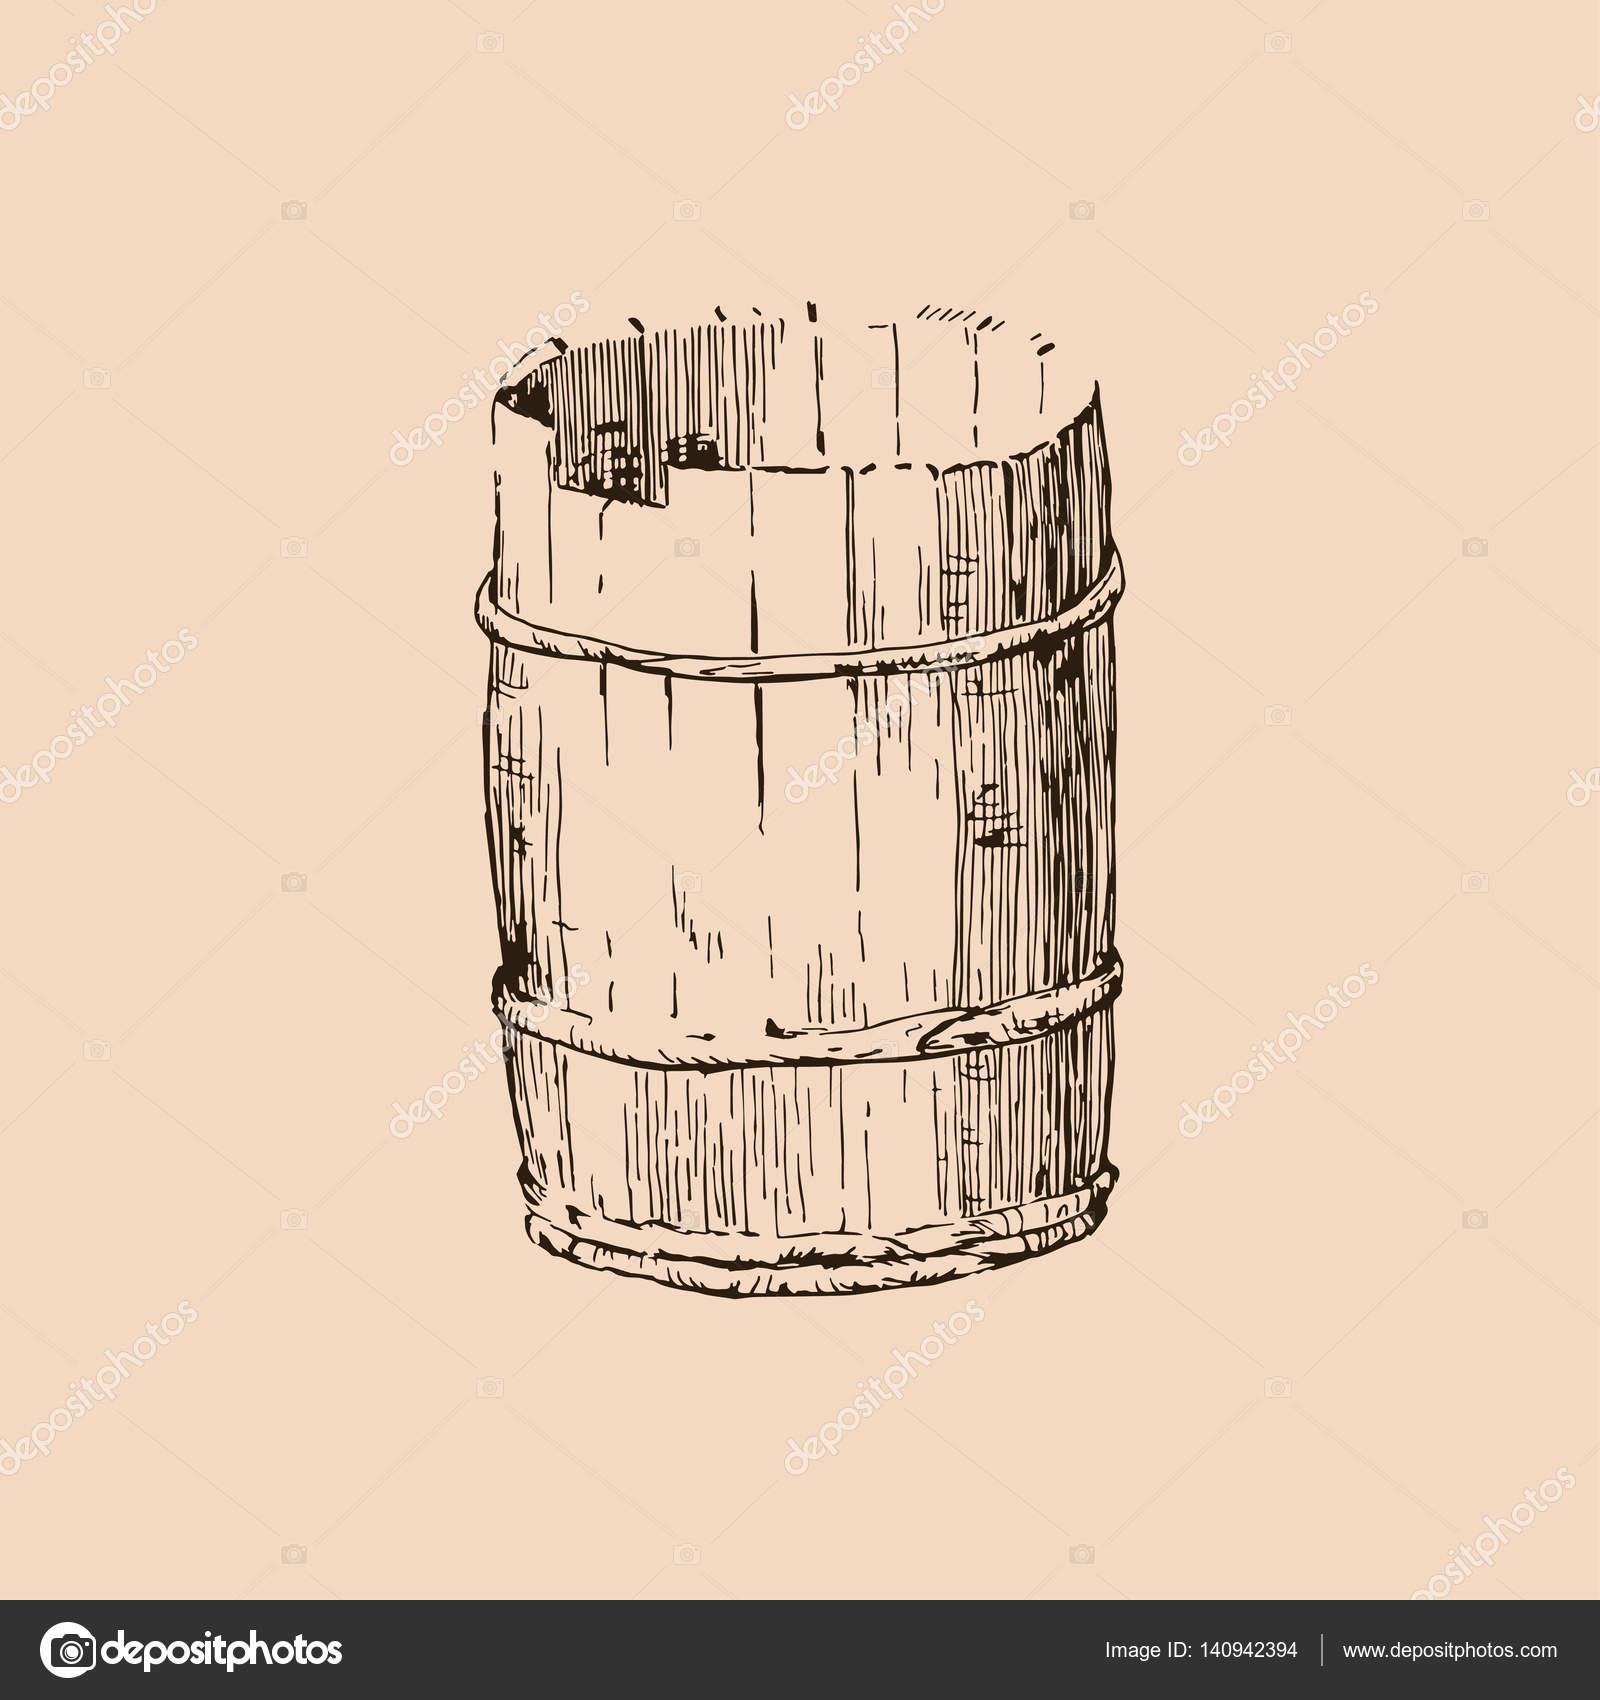 1600x1700 Vector Wooden Barrel. Hand Drawn Vintage Illustration In Engraved